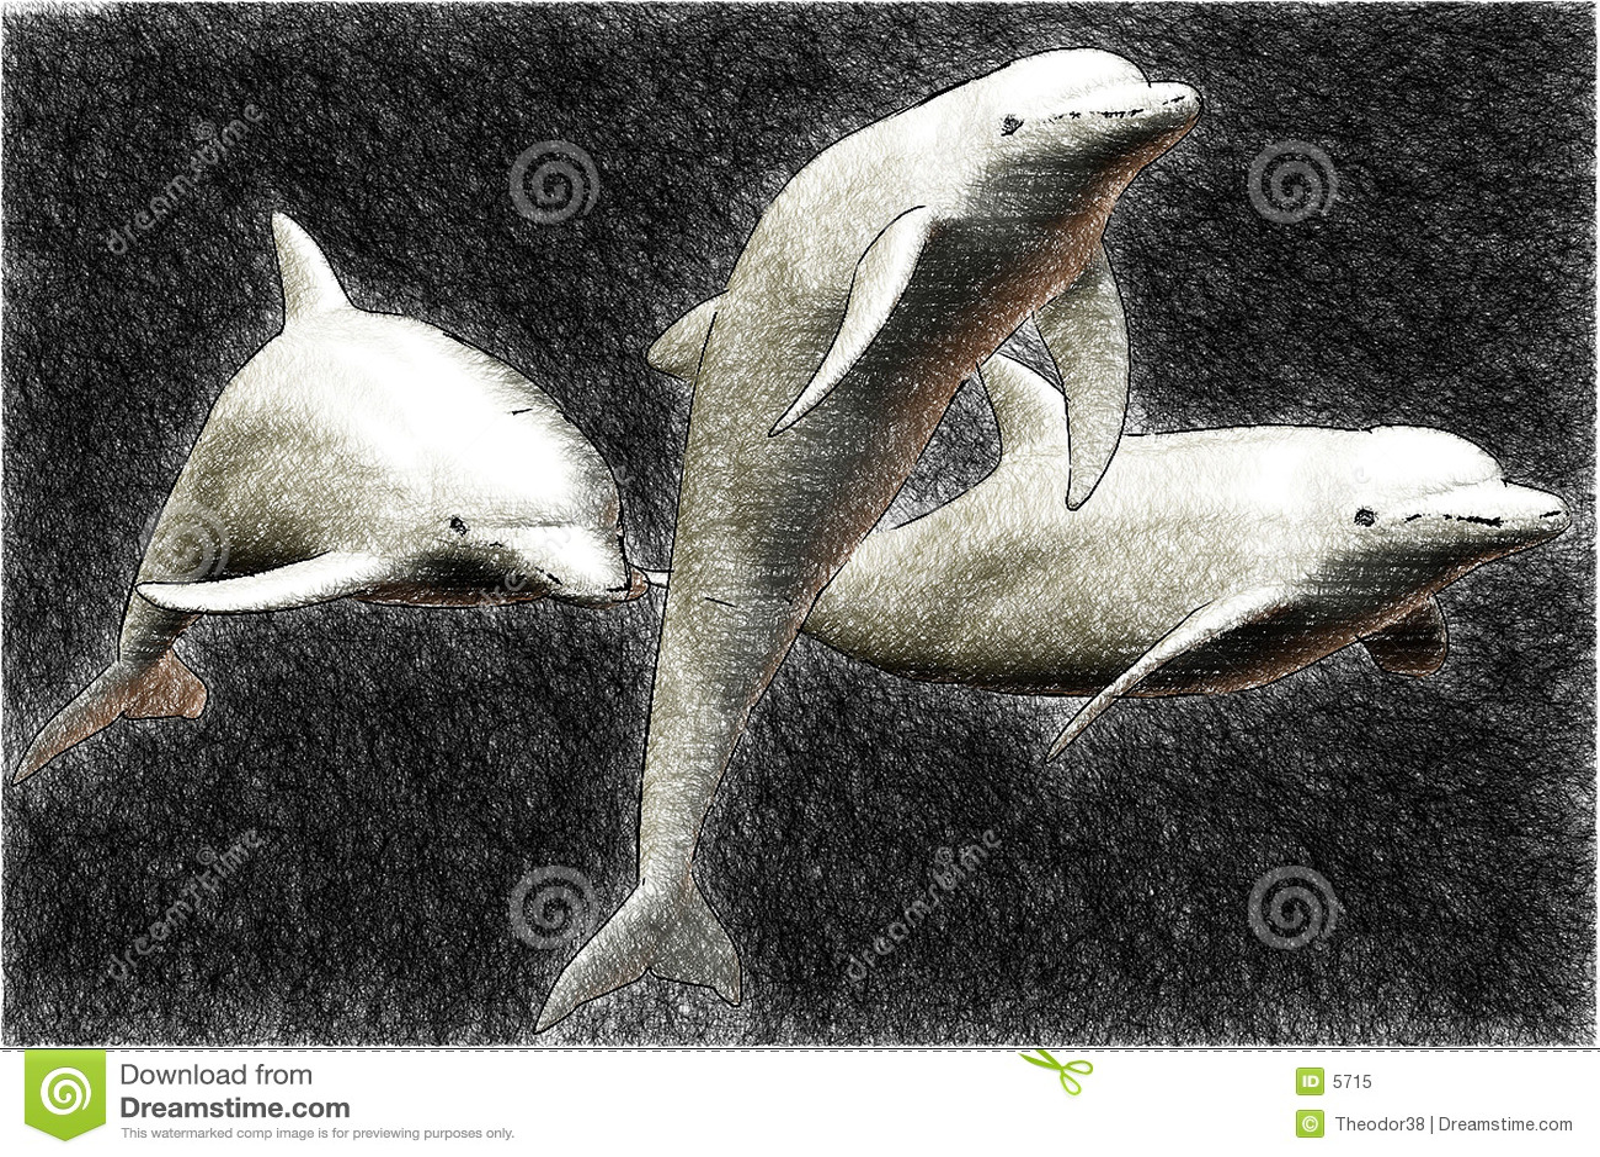 3 dolphin sketch